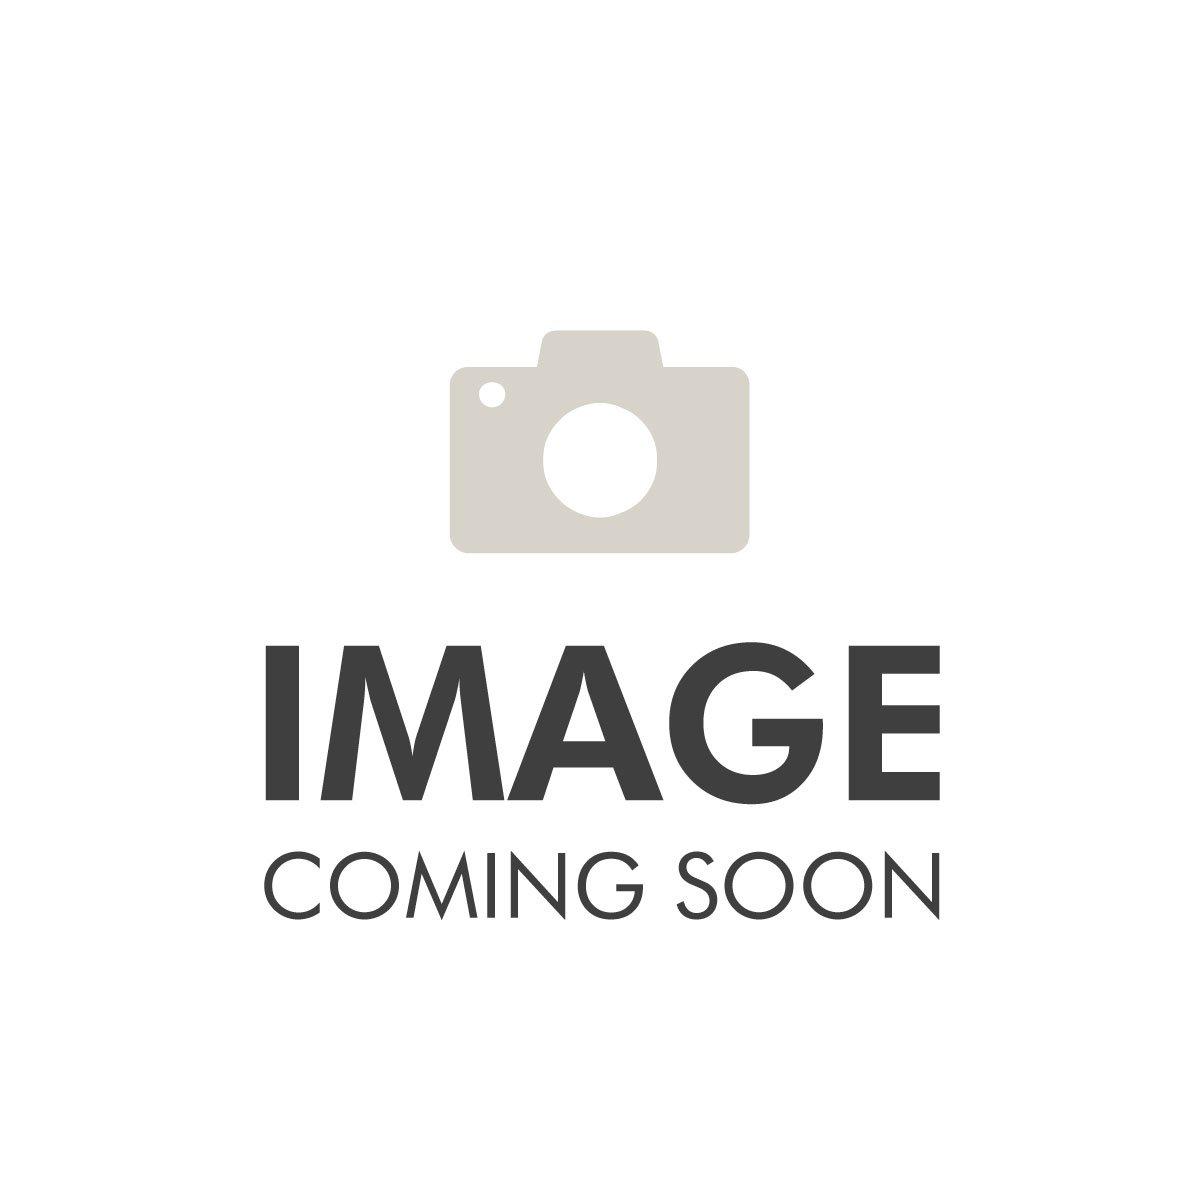 Schermasport - Ressort de pointe d'épée (10-Pack)